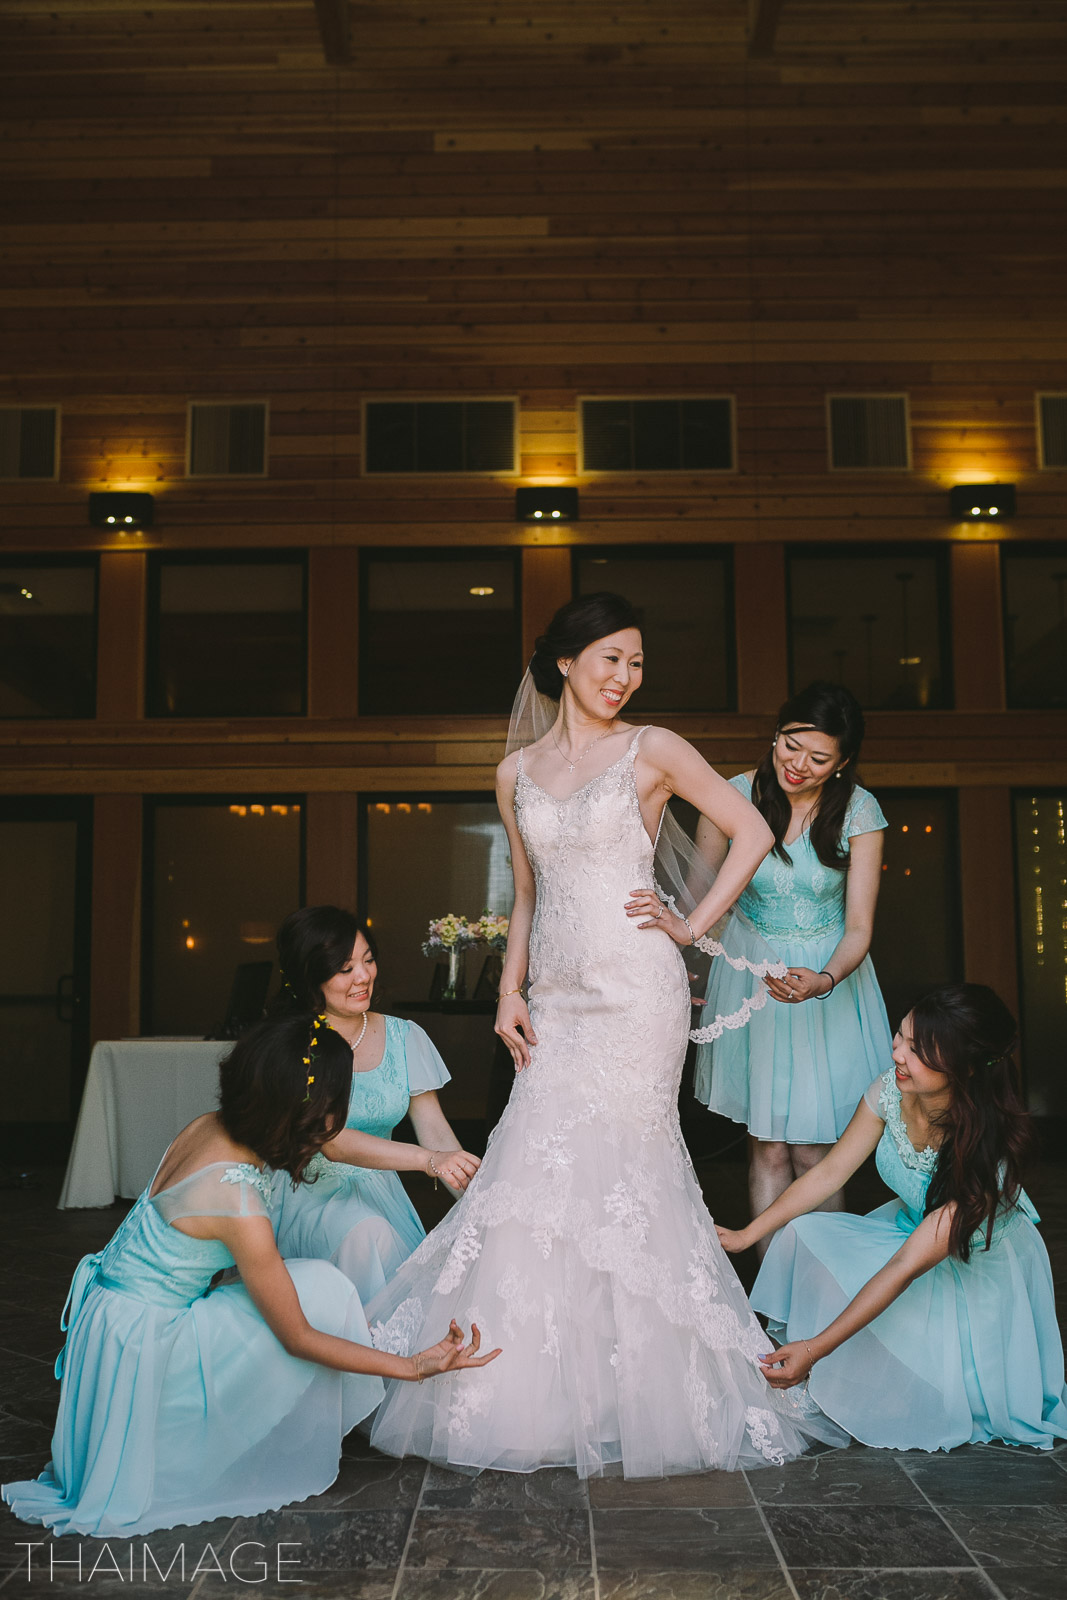 00040-20160612- JuneEdmond-Chung-Wedding.jpg